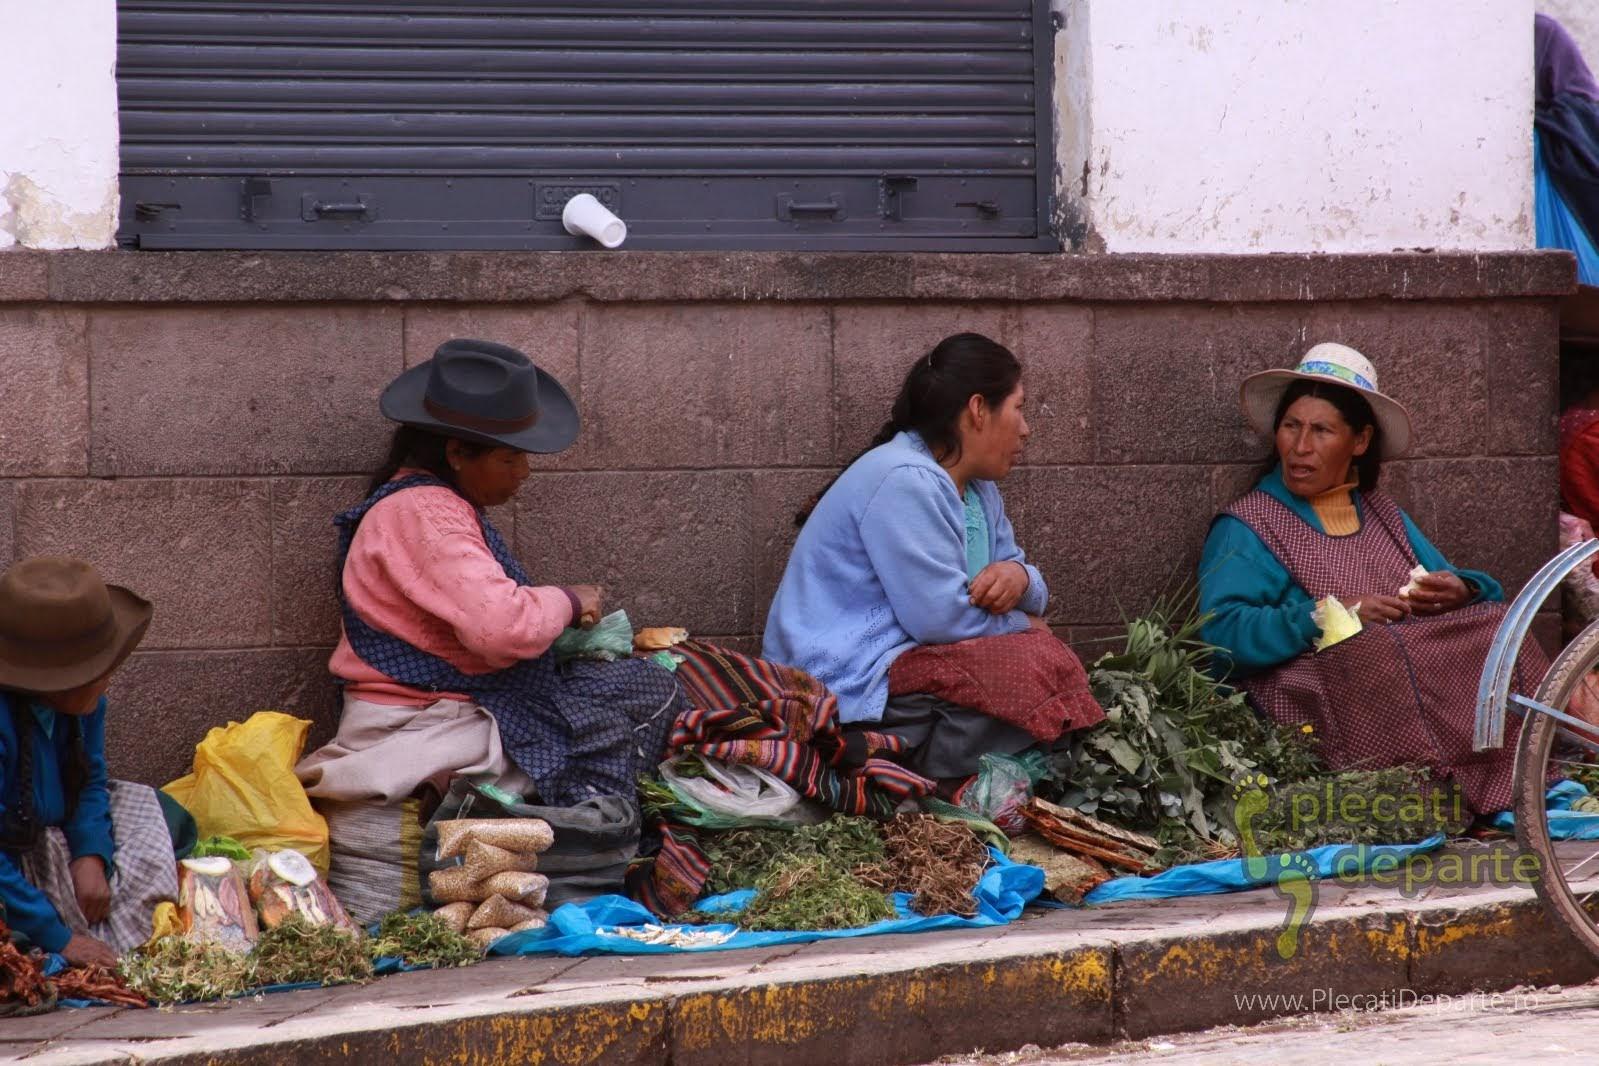 vanzatoare de legume si verdeturi in piata traditionala Mercado San Pedro, Cusco, Peru